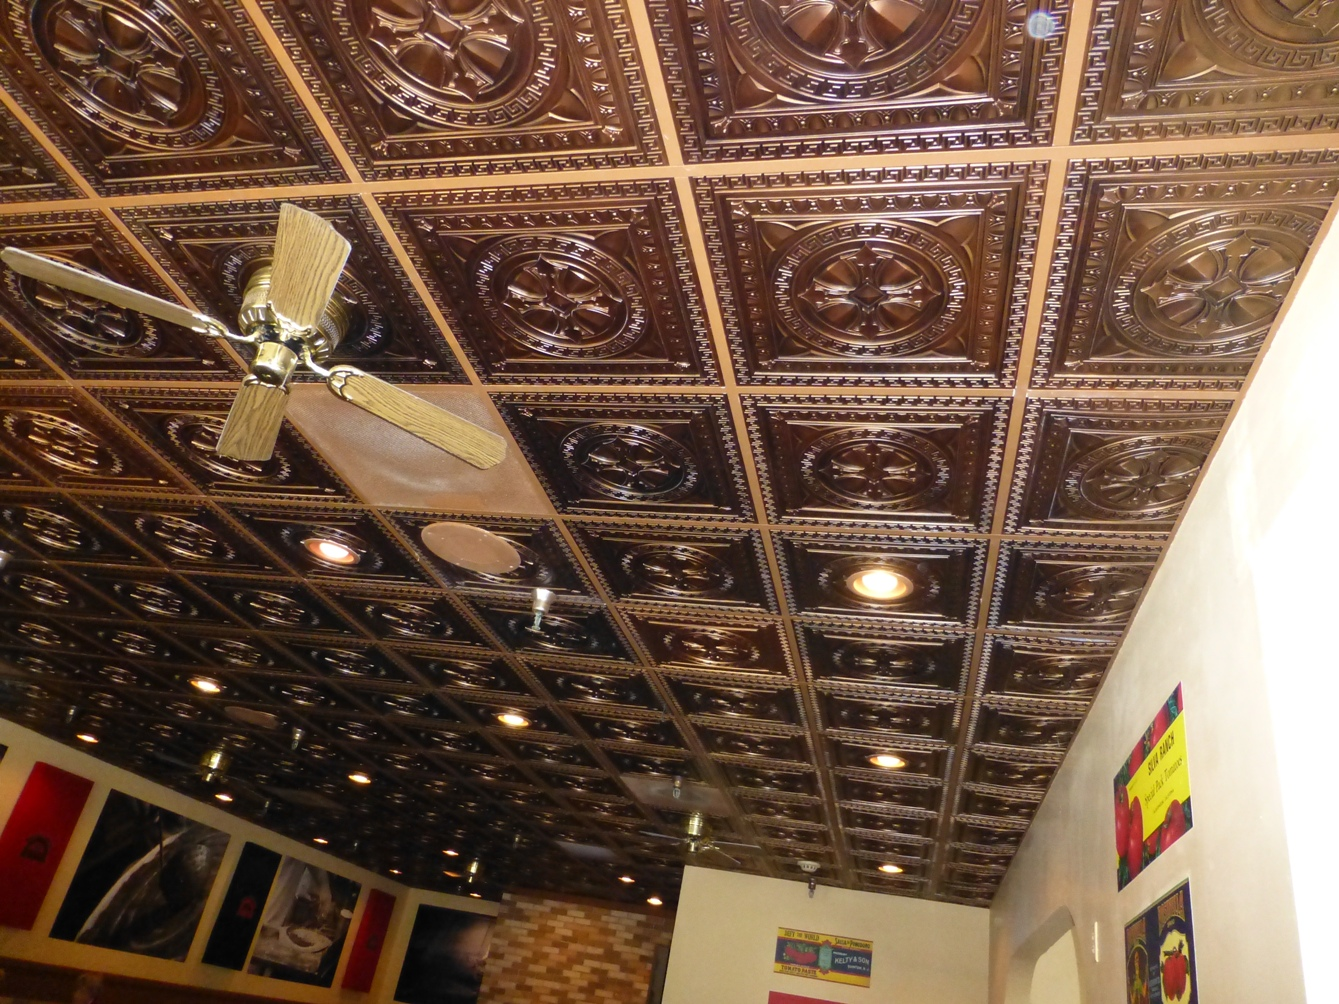 Ceiling tile grid